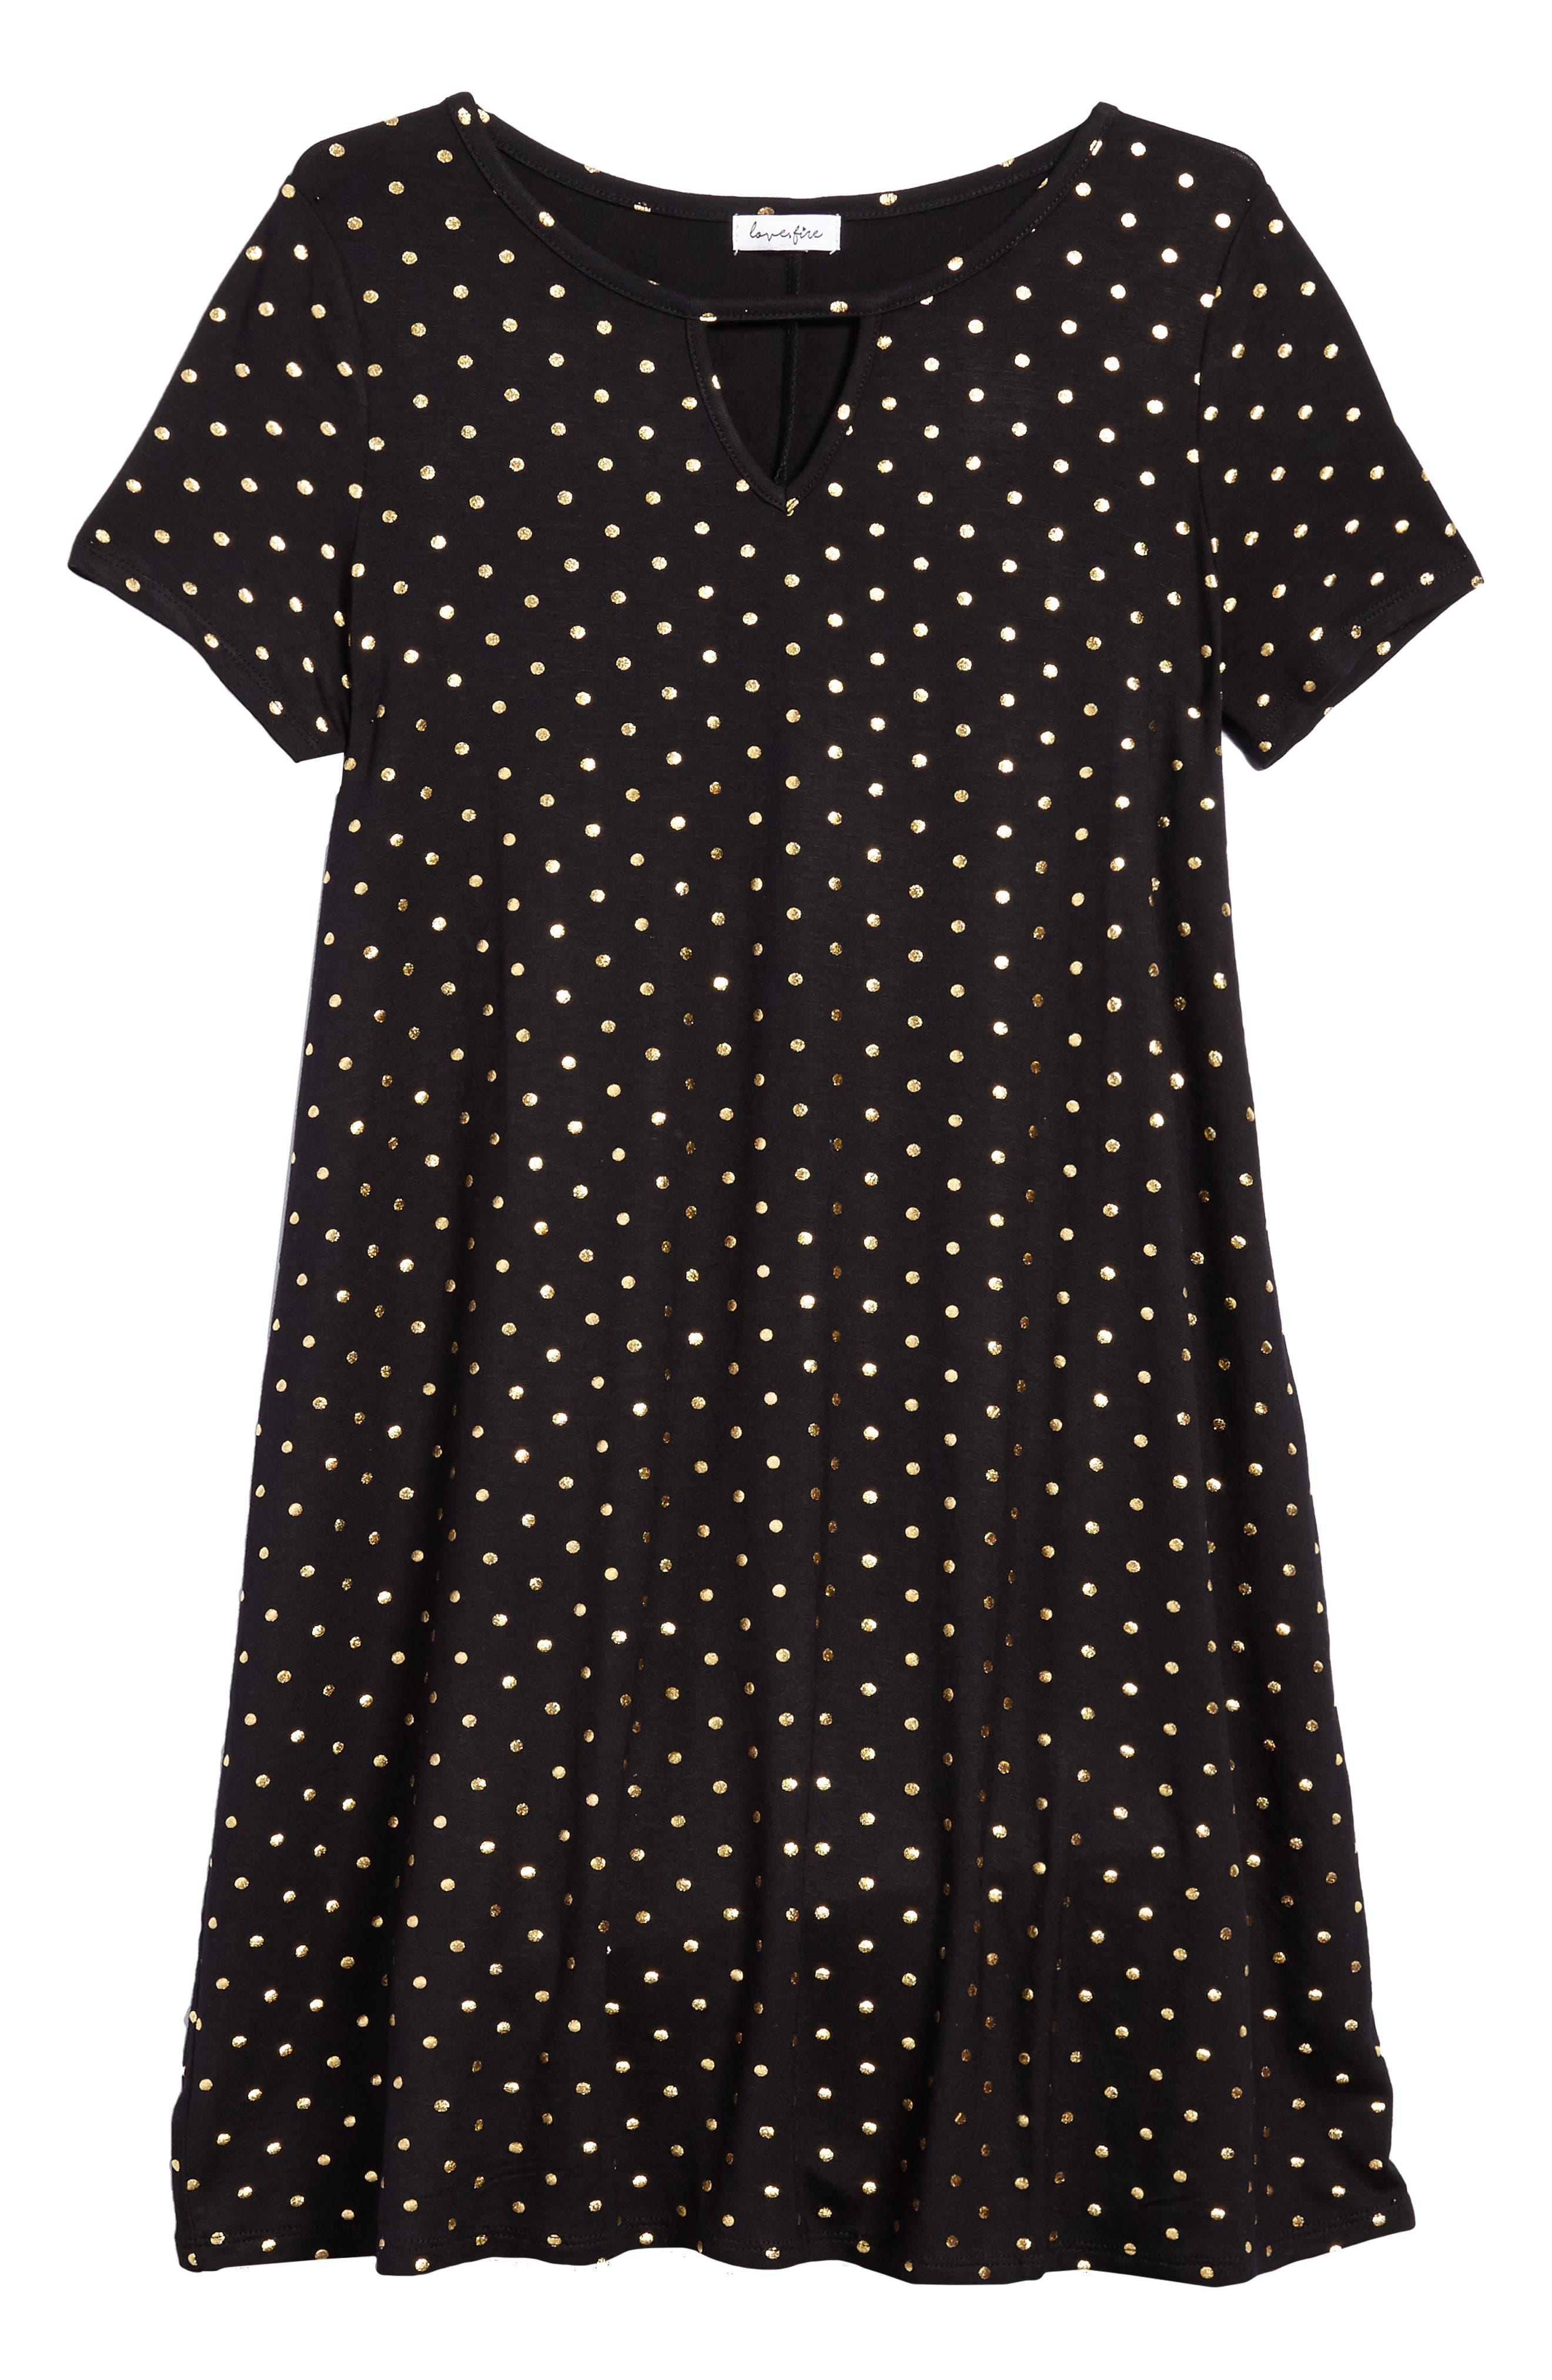 Foil Polka Dot Jersey Dress,                             Main thumbnail 1, color,                             005